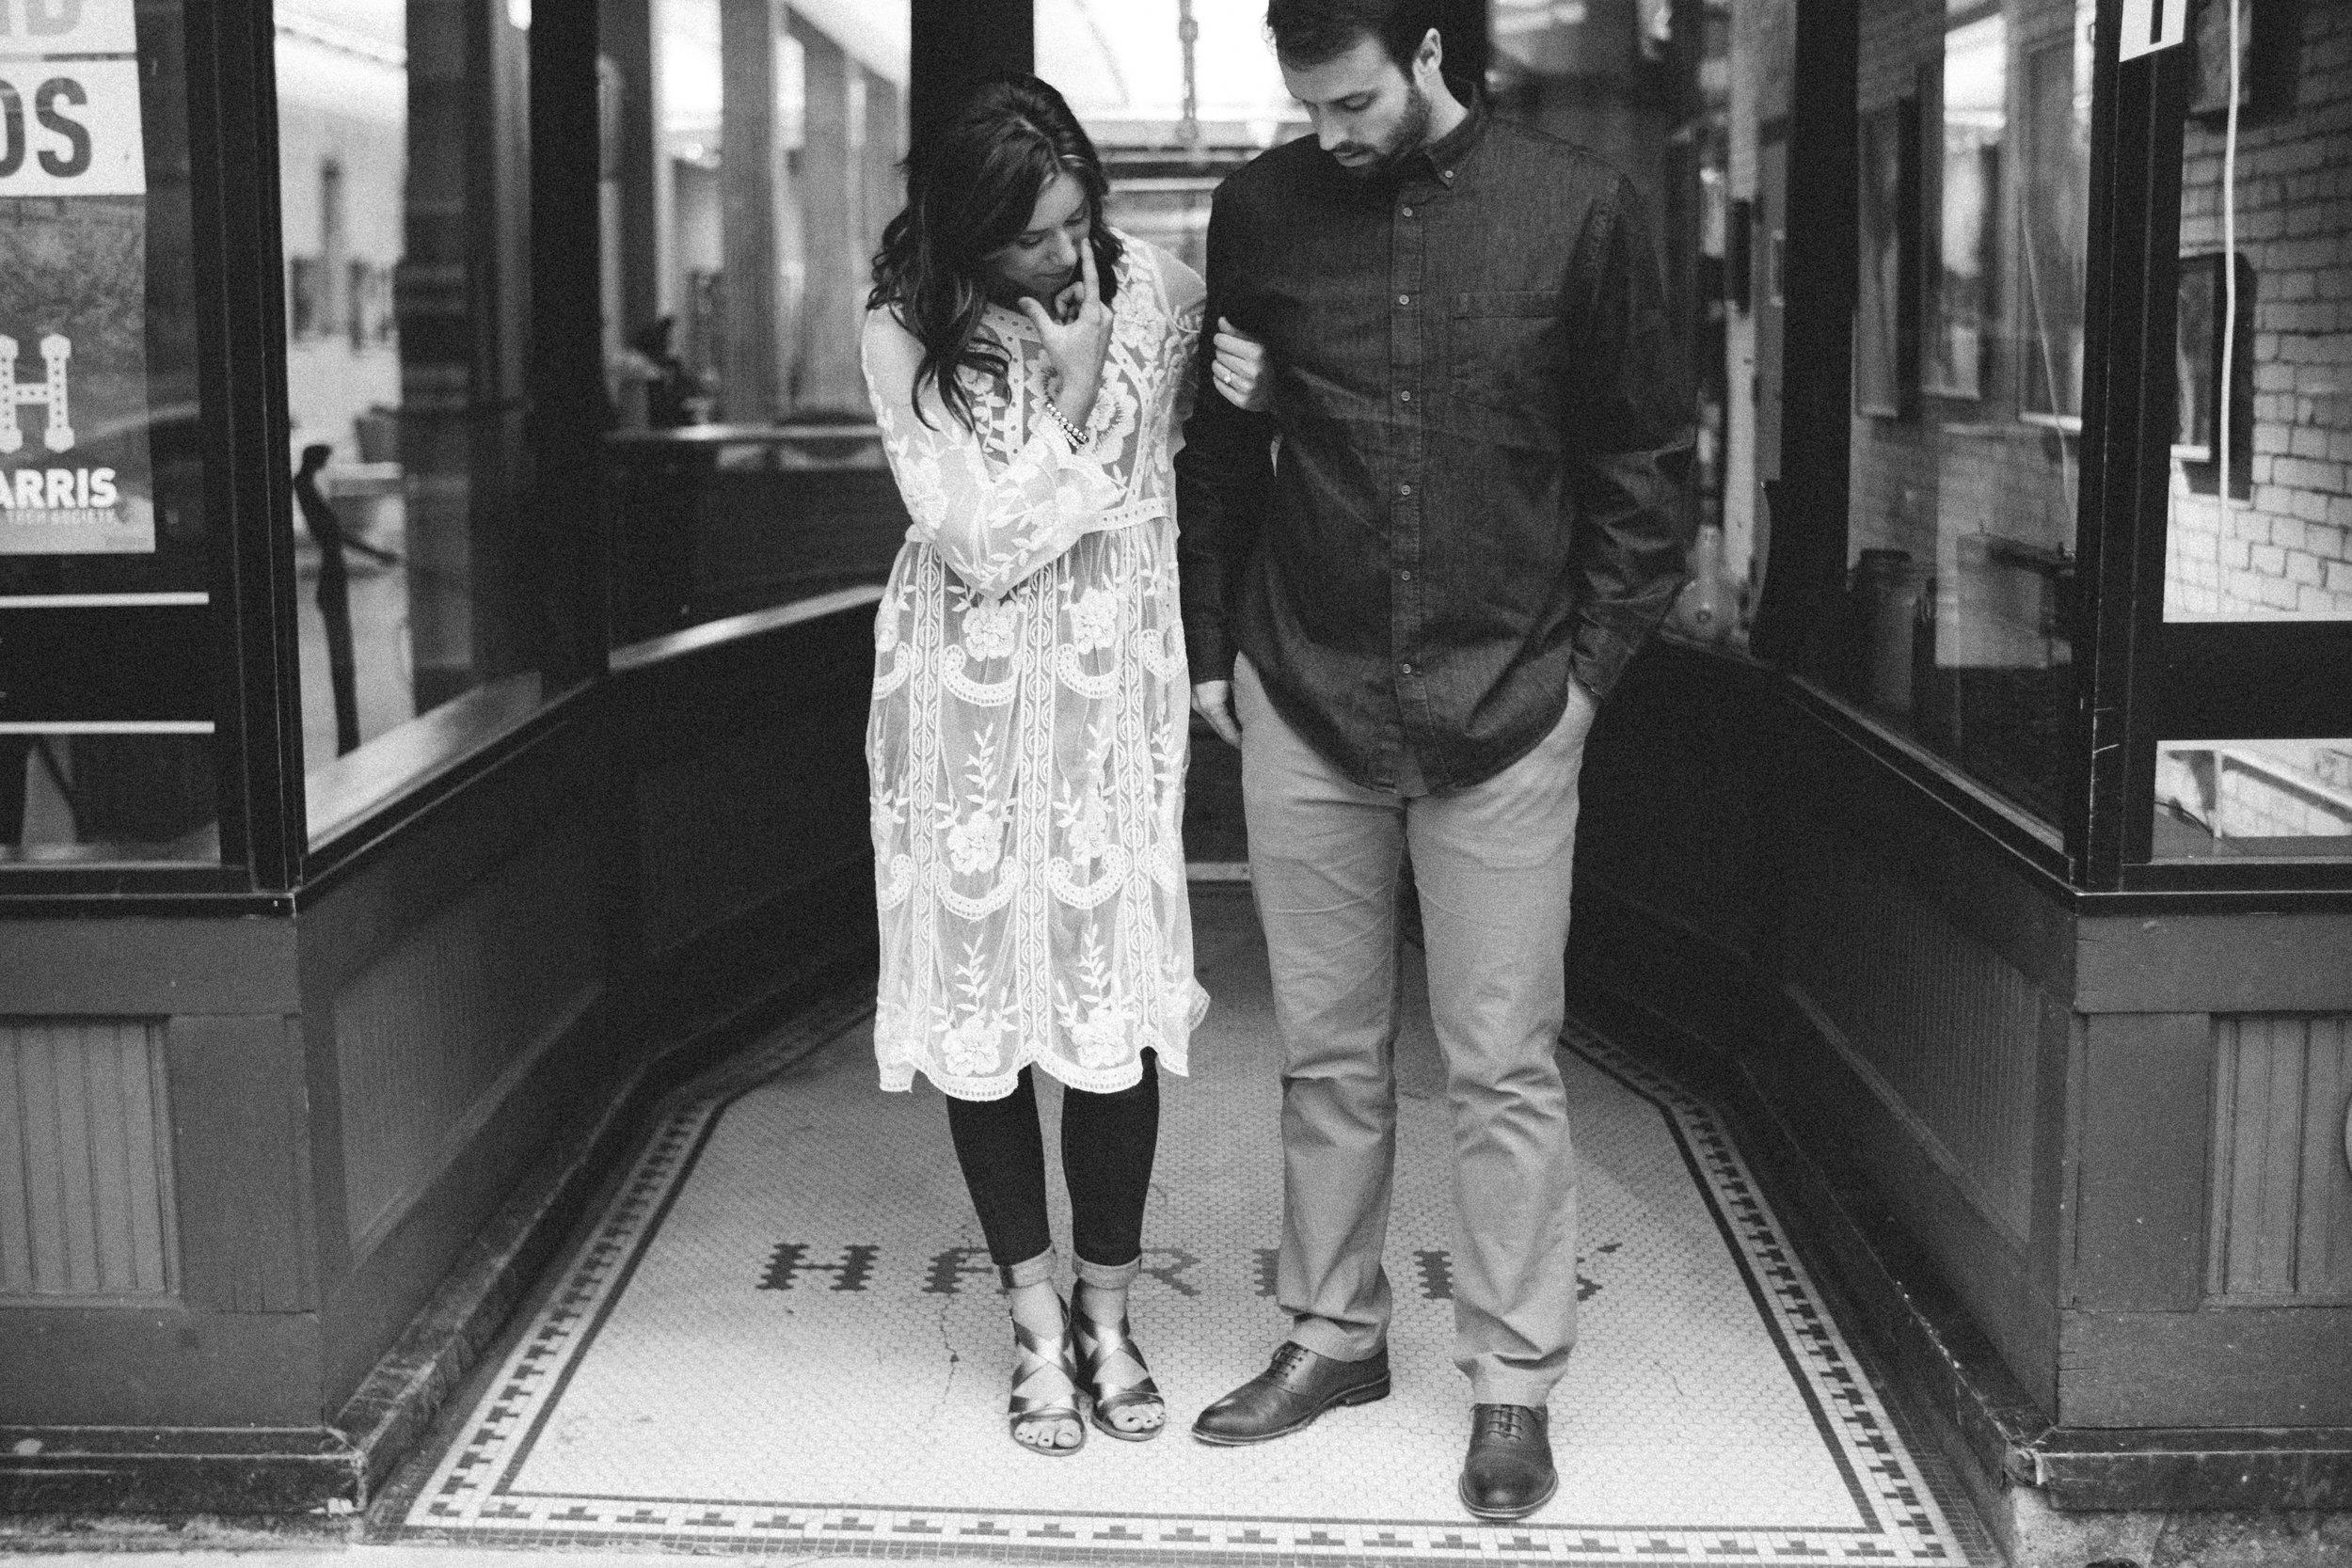 Lauren_Nick_Manzer_Bailey_Engagement_Photos_0209.jpg